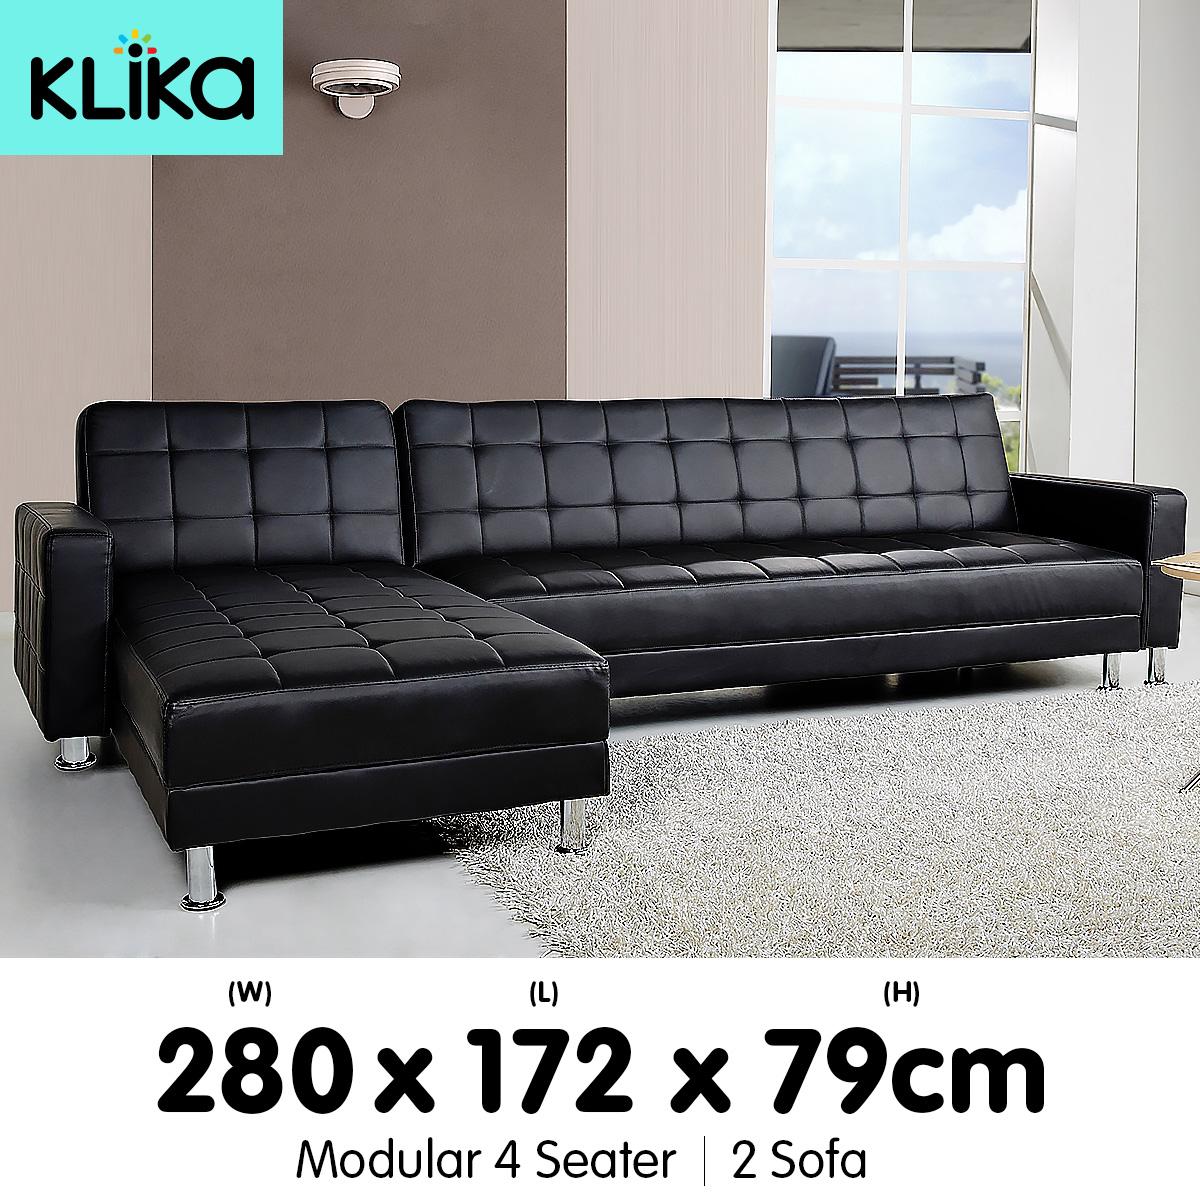 corner lounge sofa bed recliner josain sectional couch modular furniture home pu